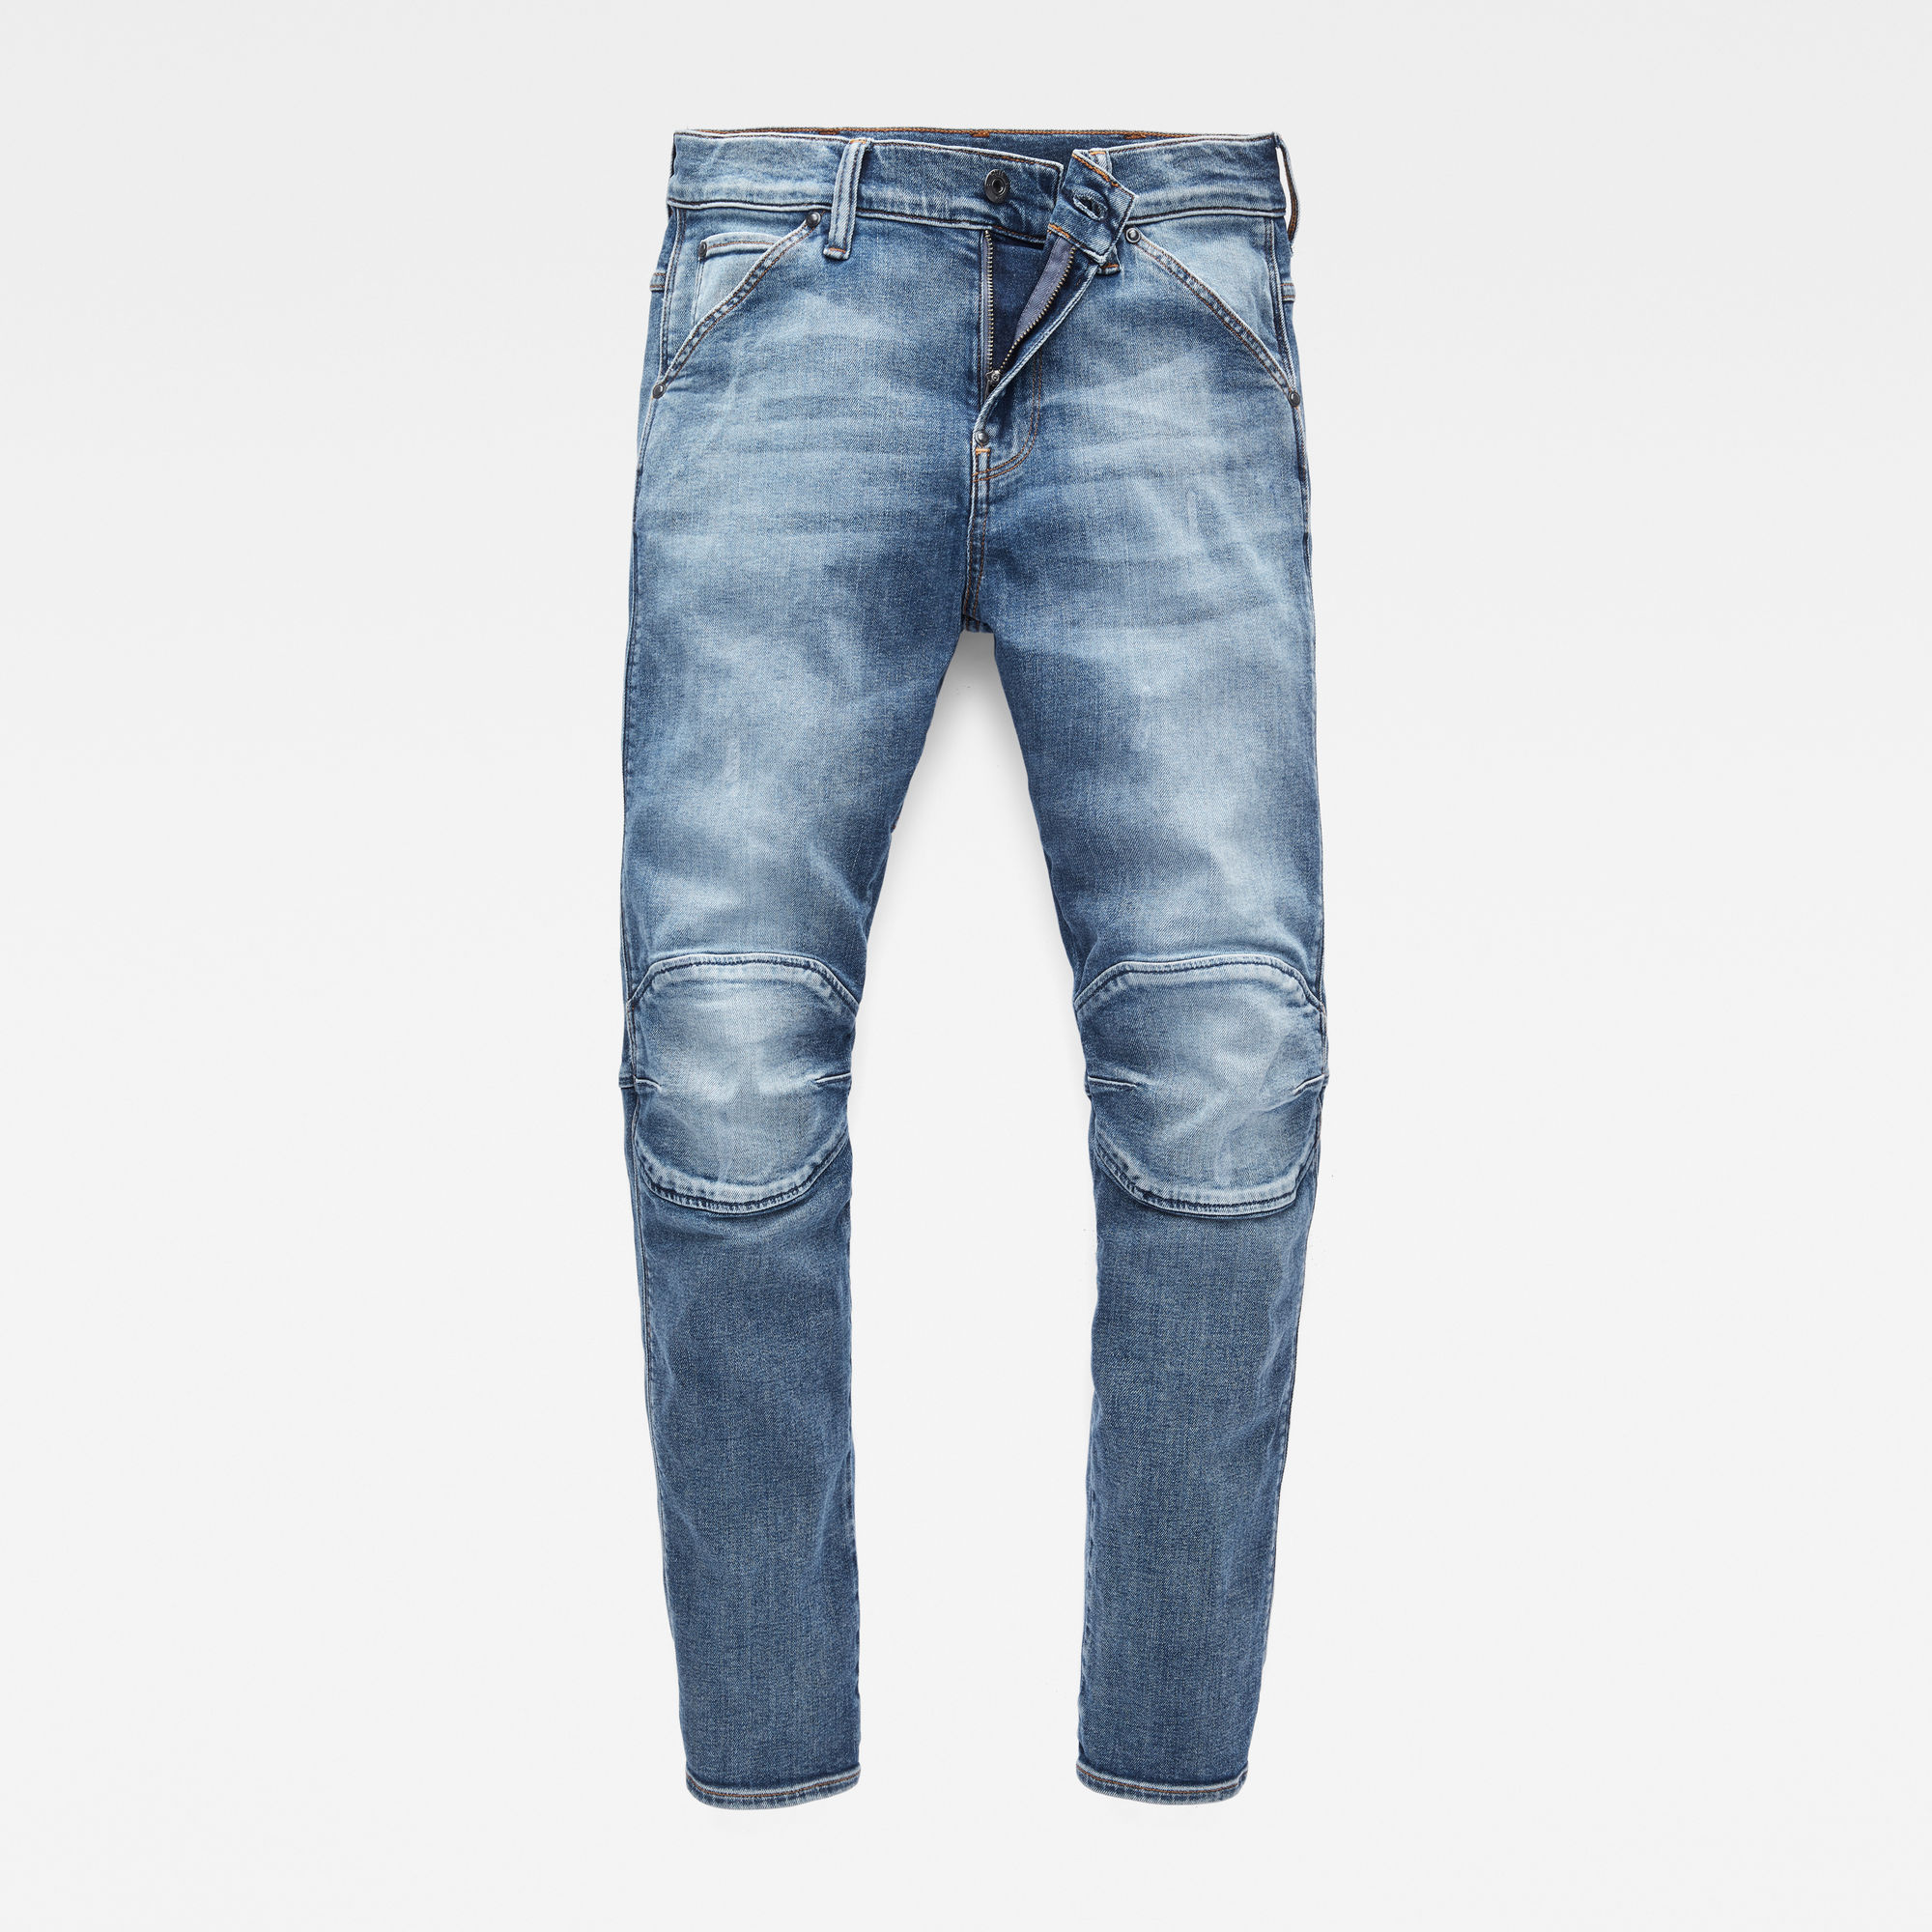 G-Star RAW Jongens 5622 G-Star Elwood Slim jeans Blauw